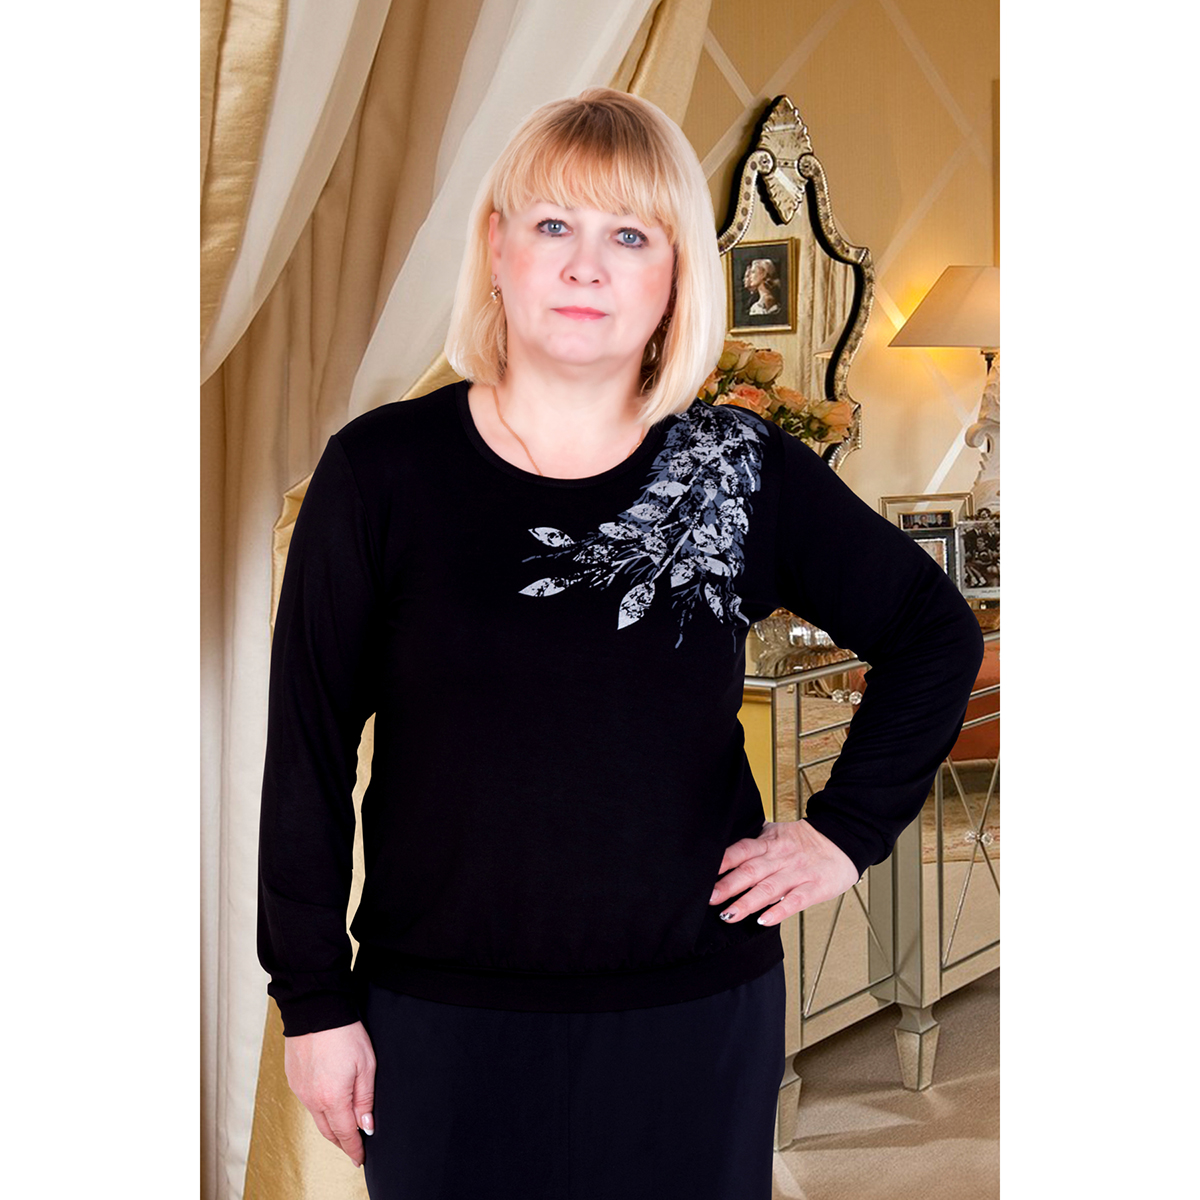 Женская блуза Лира Черный, размер 54Блузки, майки, кофты<br>Обхват груди:108 см<br>Обхват талии:88 см<br>Обхват бедер:116 см<br>Рост:167 см<br><br>Тип: Жен. блуза<br>Размер: 54<br>Материал: Вискоза